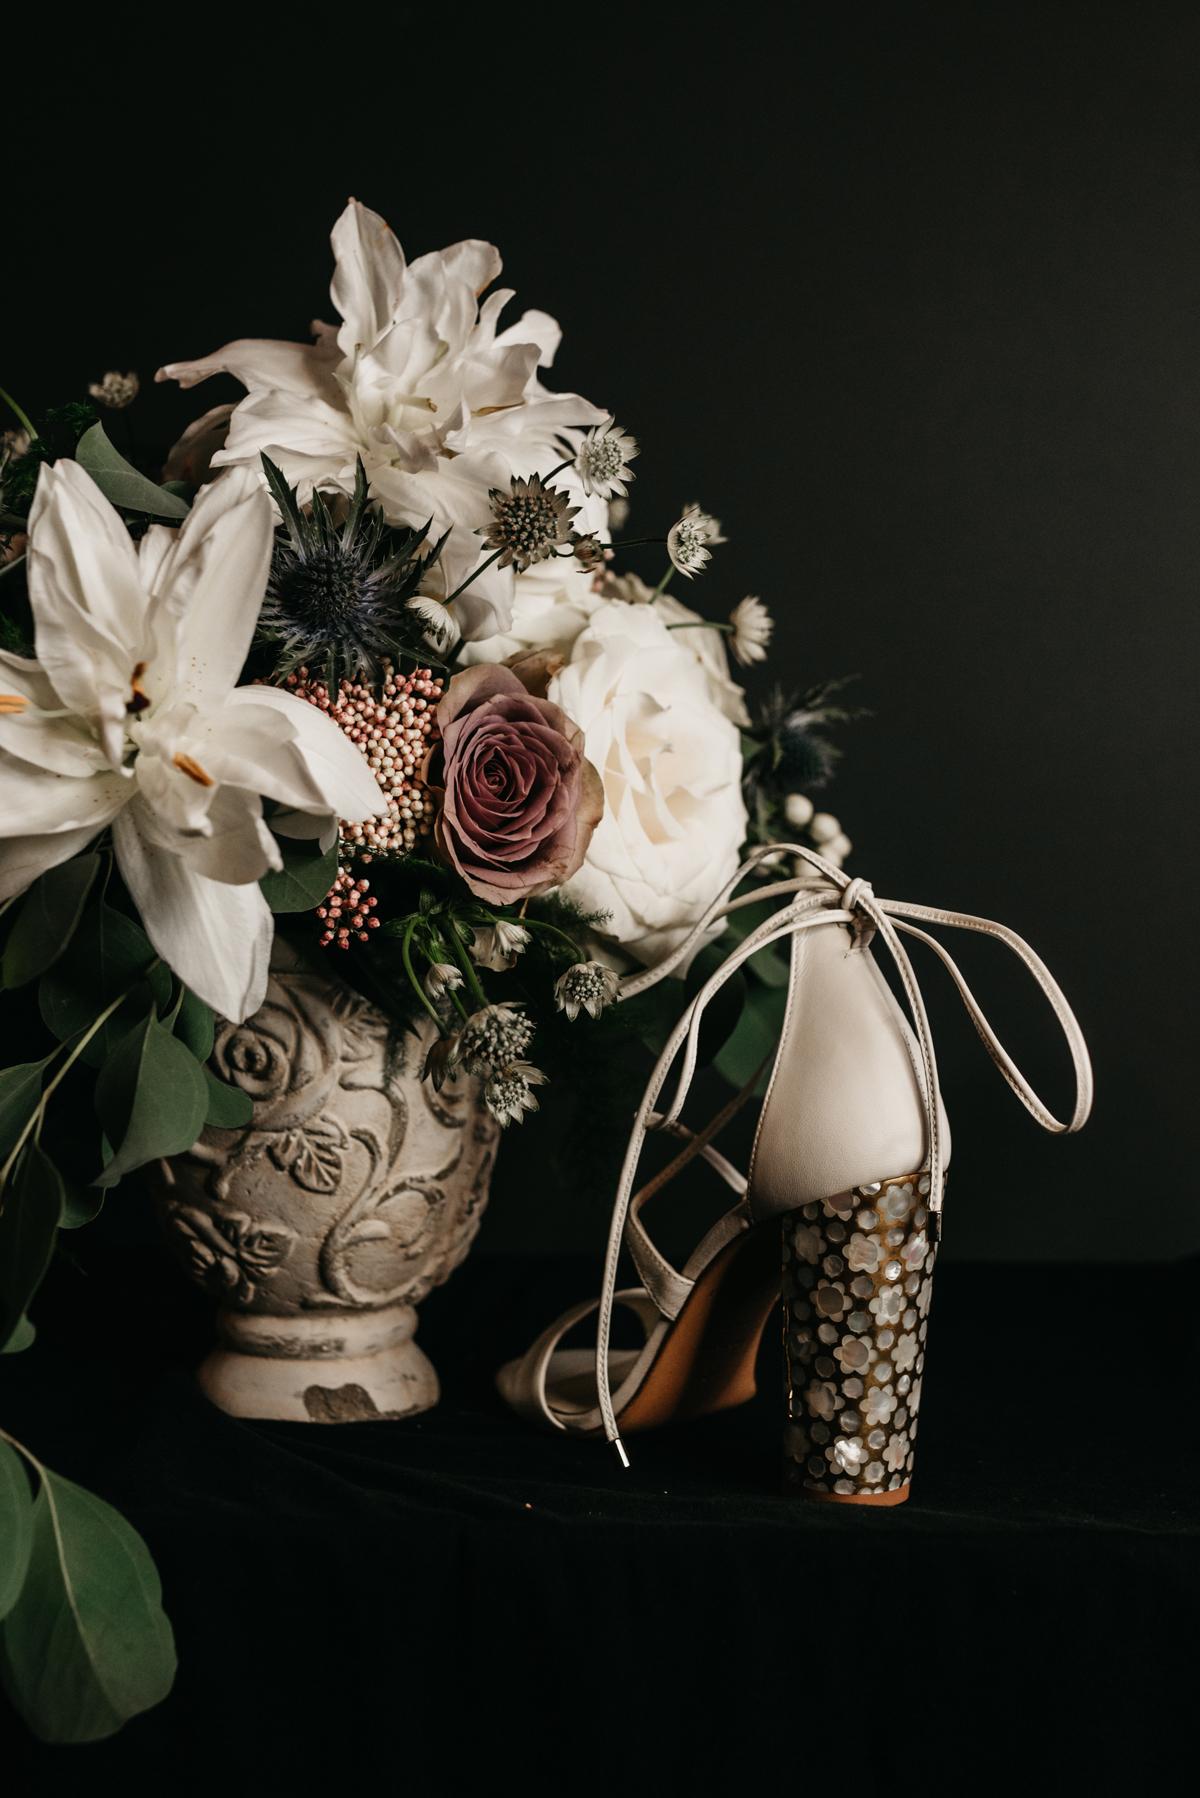 db193e4bdab69f Freya Rose Shoes - Freya Rose Shoes - Win £500 Towards a Pair of Luxury